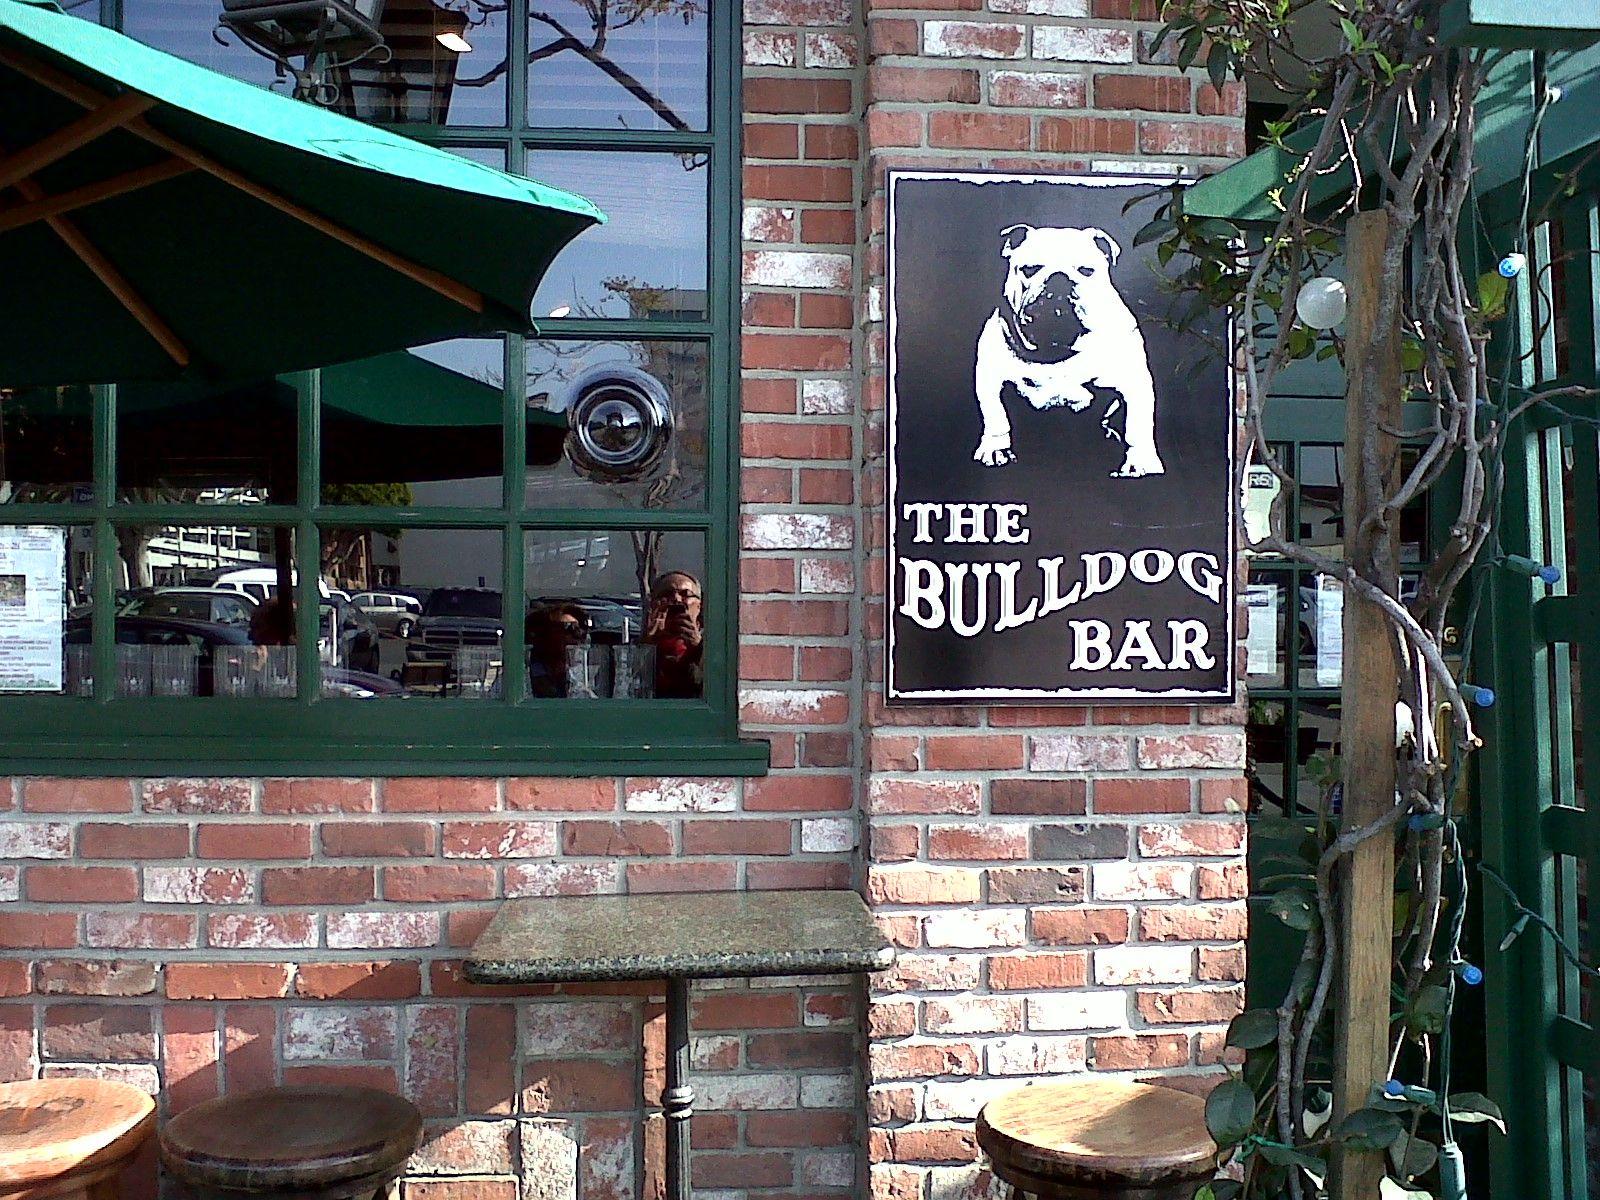 Bulldog bar santa monica ca